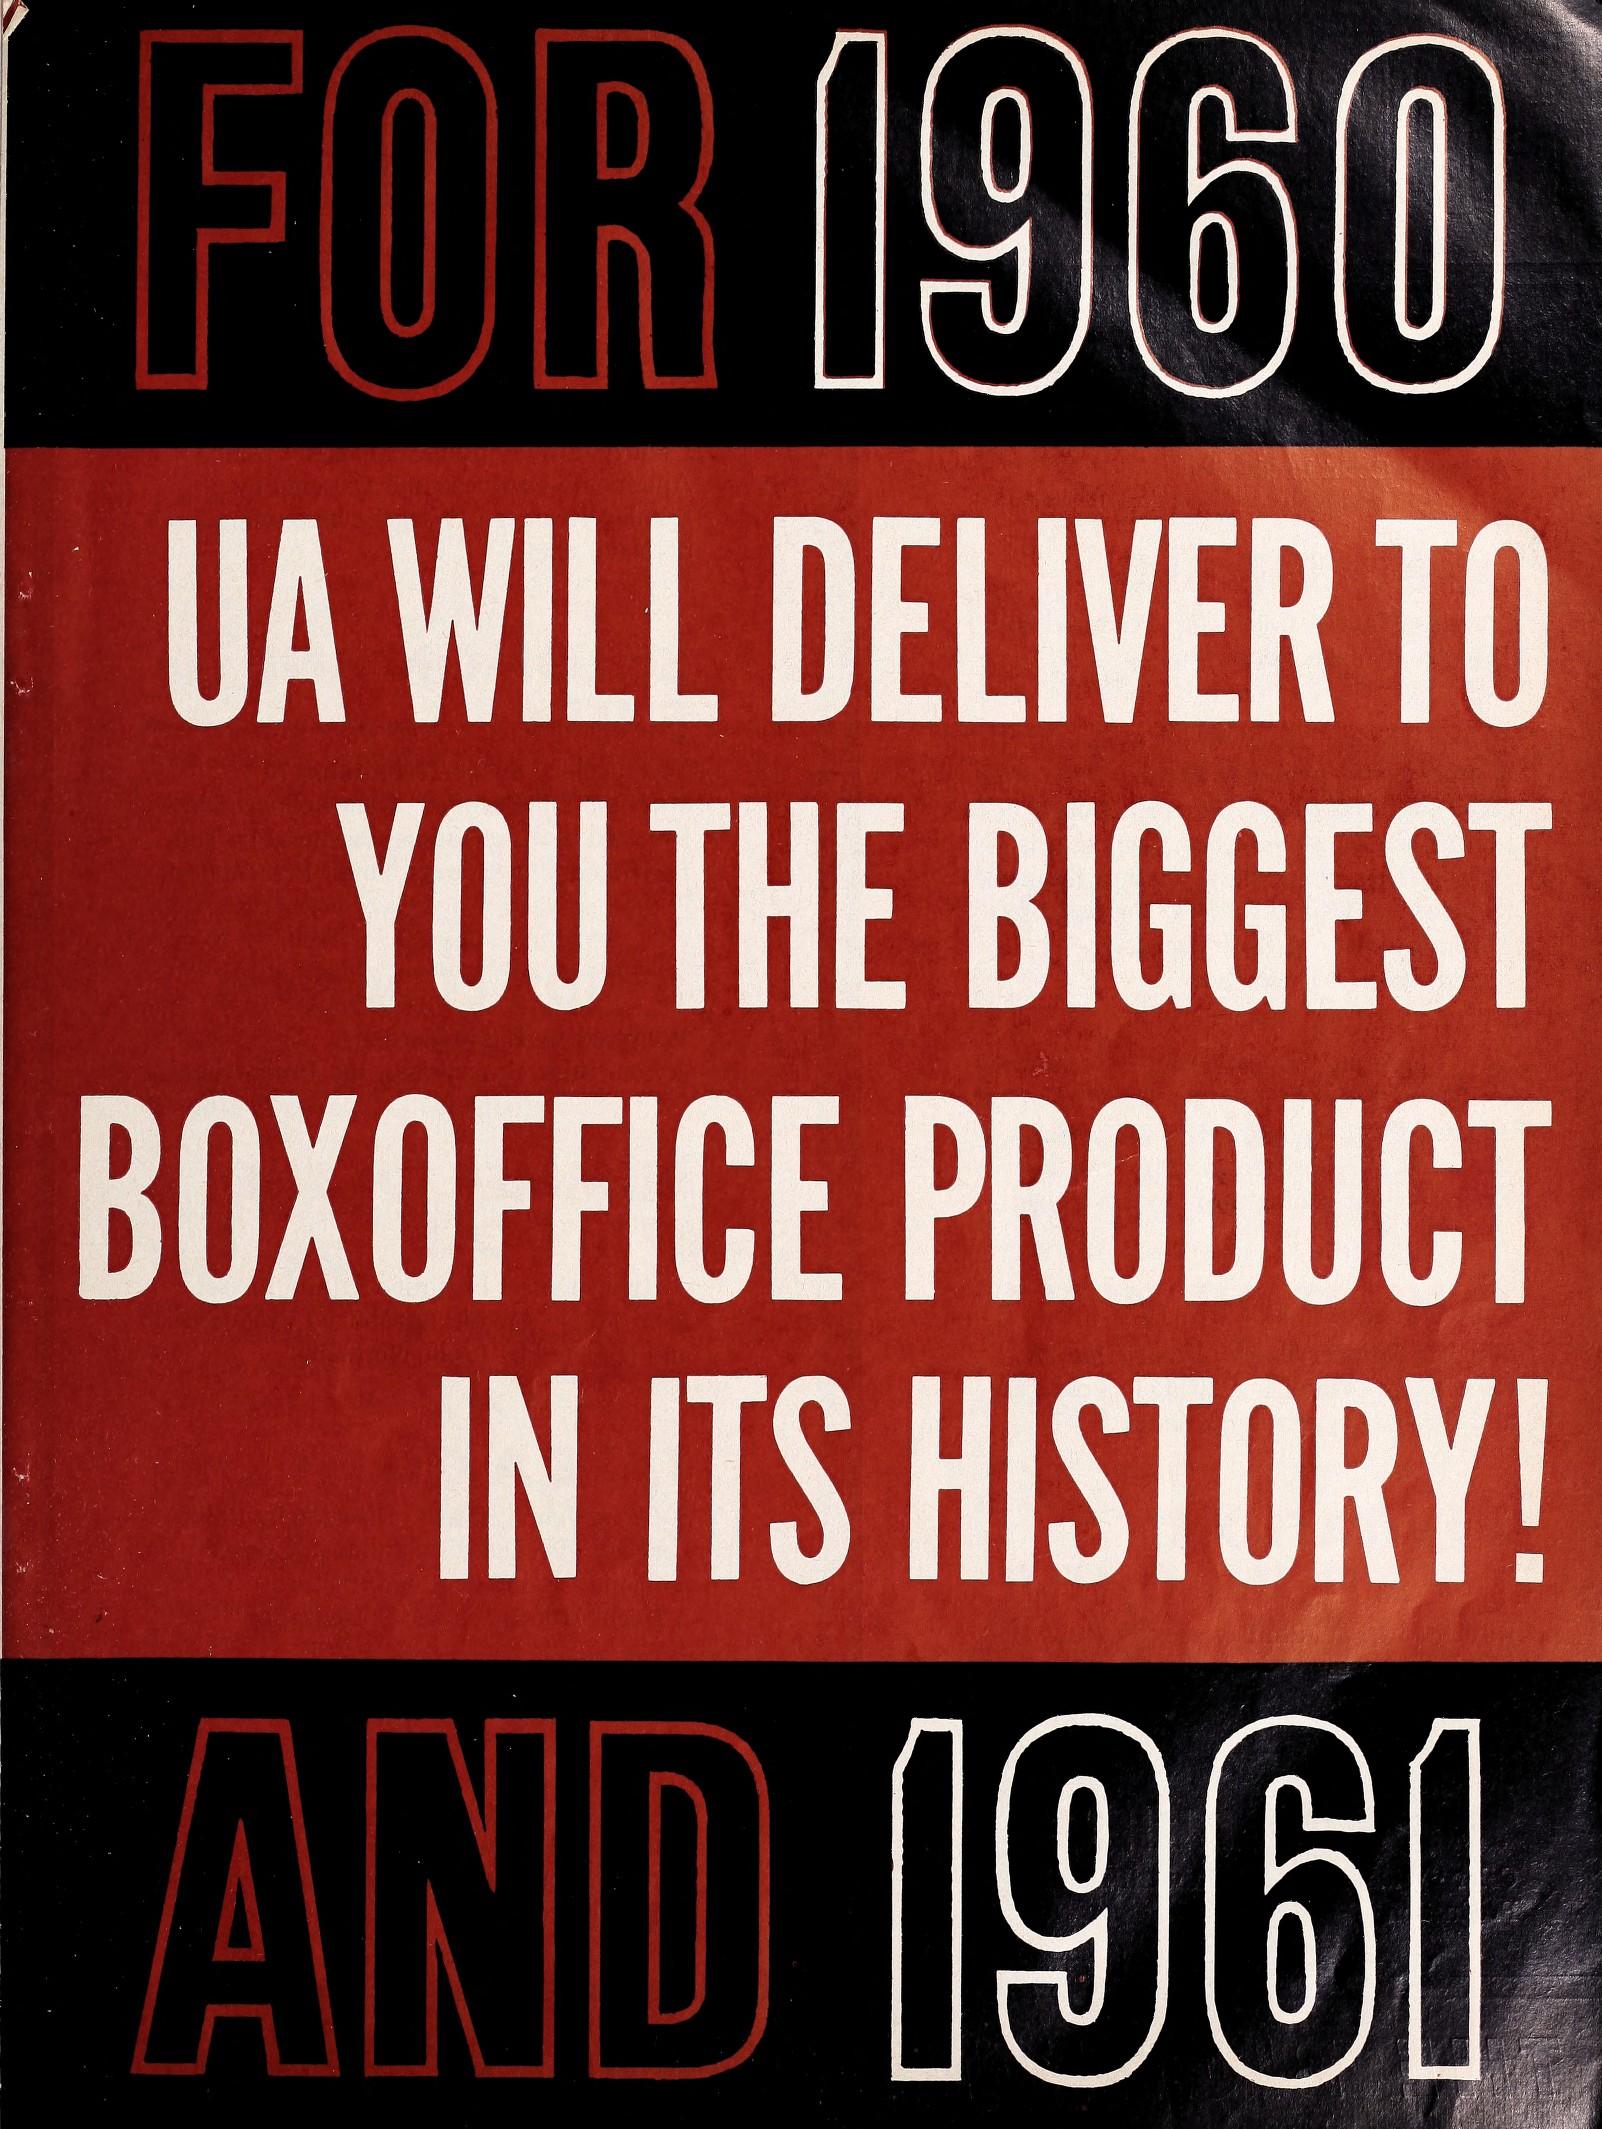 Boxofficebaromet00boxo_8_jp2.zip&file=boxofficebaromet00boxo_8_jp2%2fboxofficebaromet00boxo_8_0033